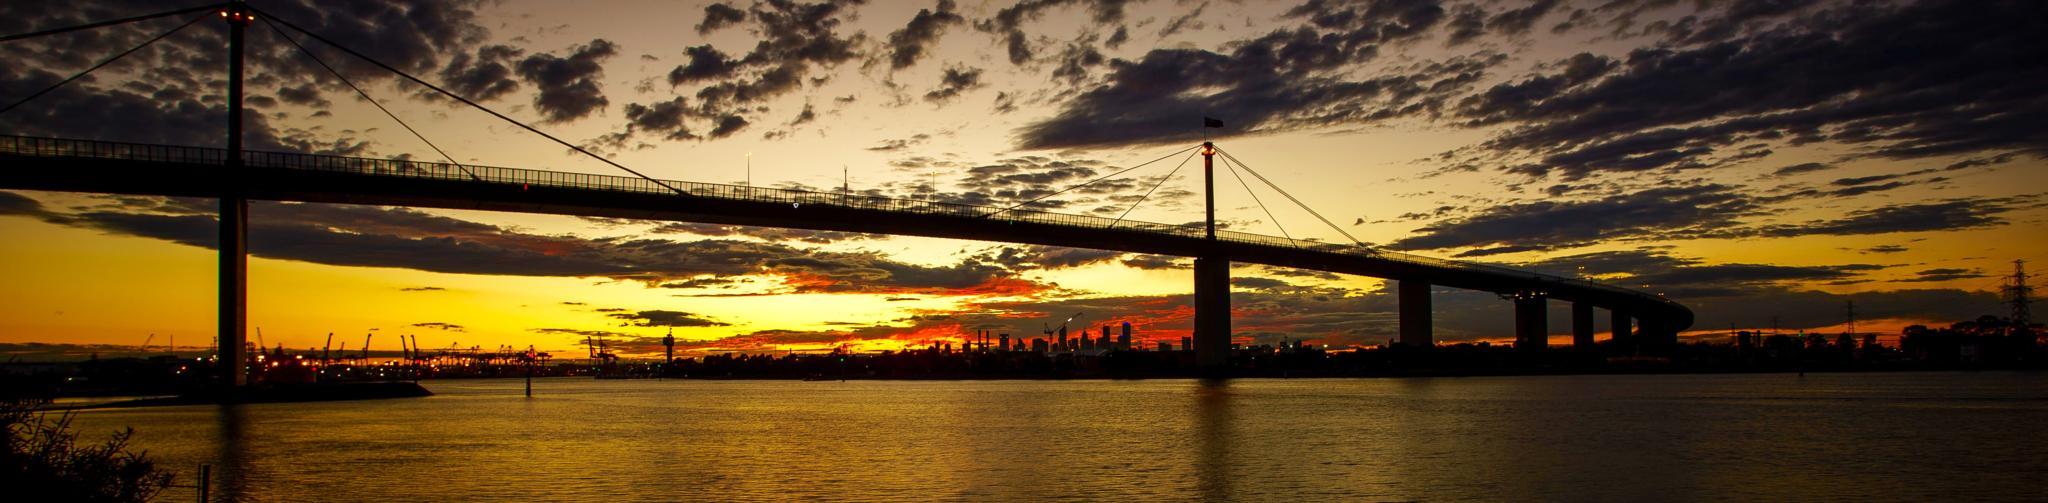 sunrise in melbourne by karlfergusson